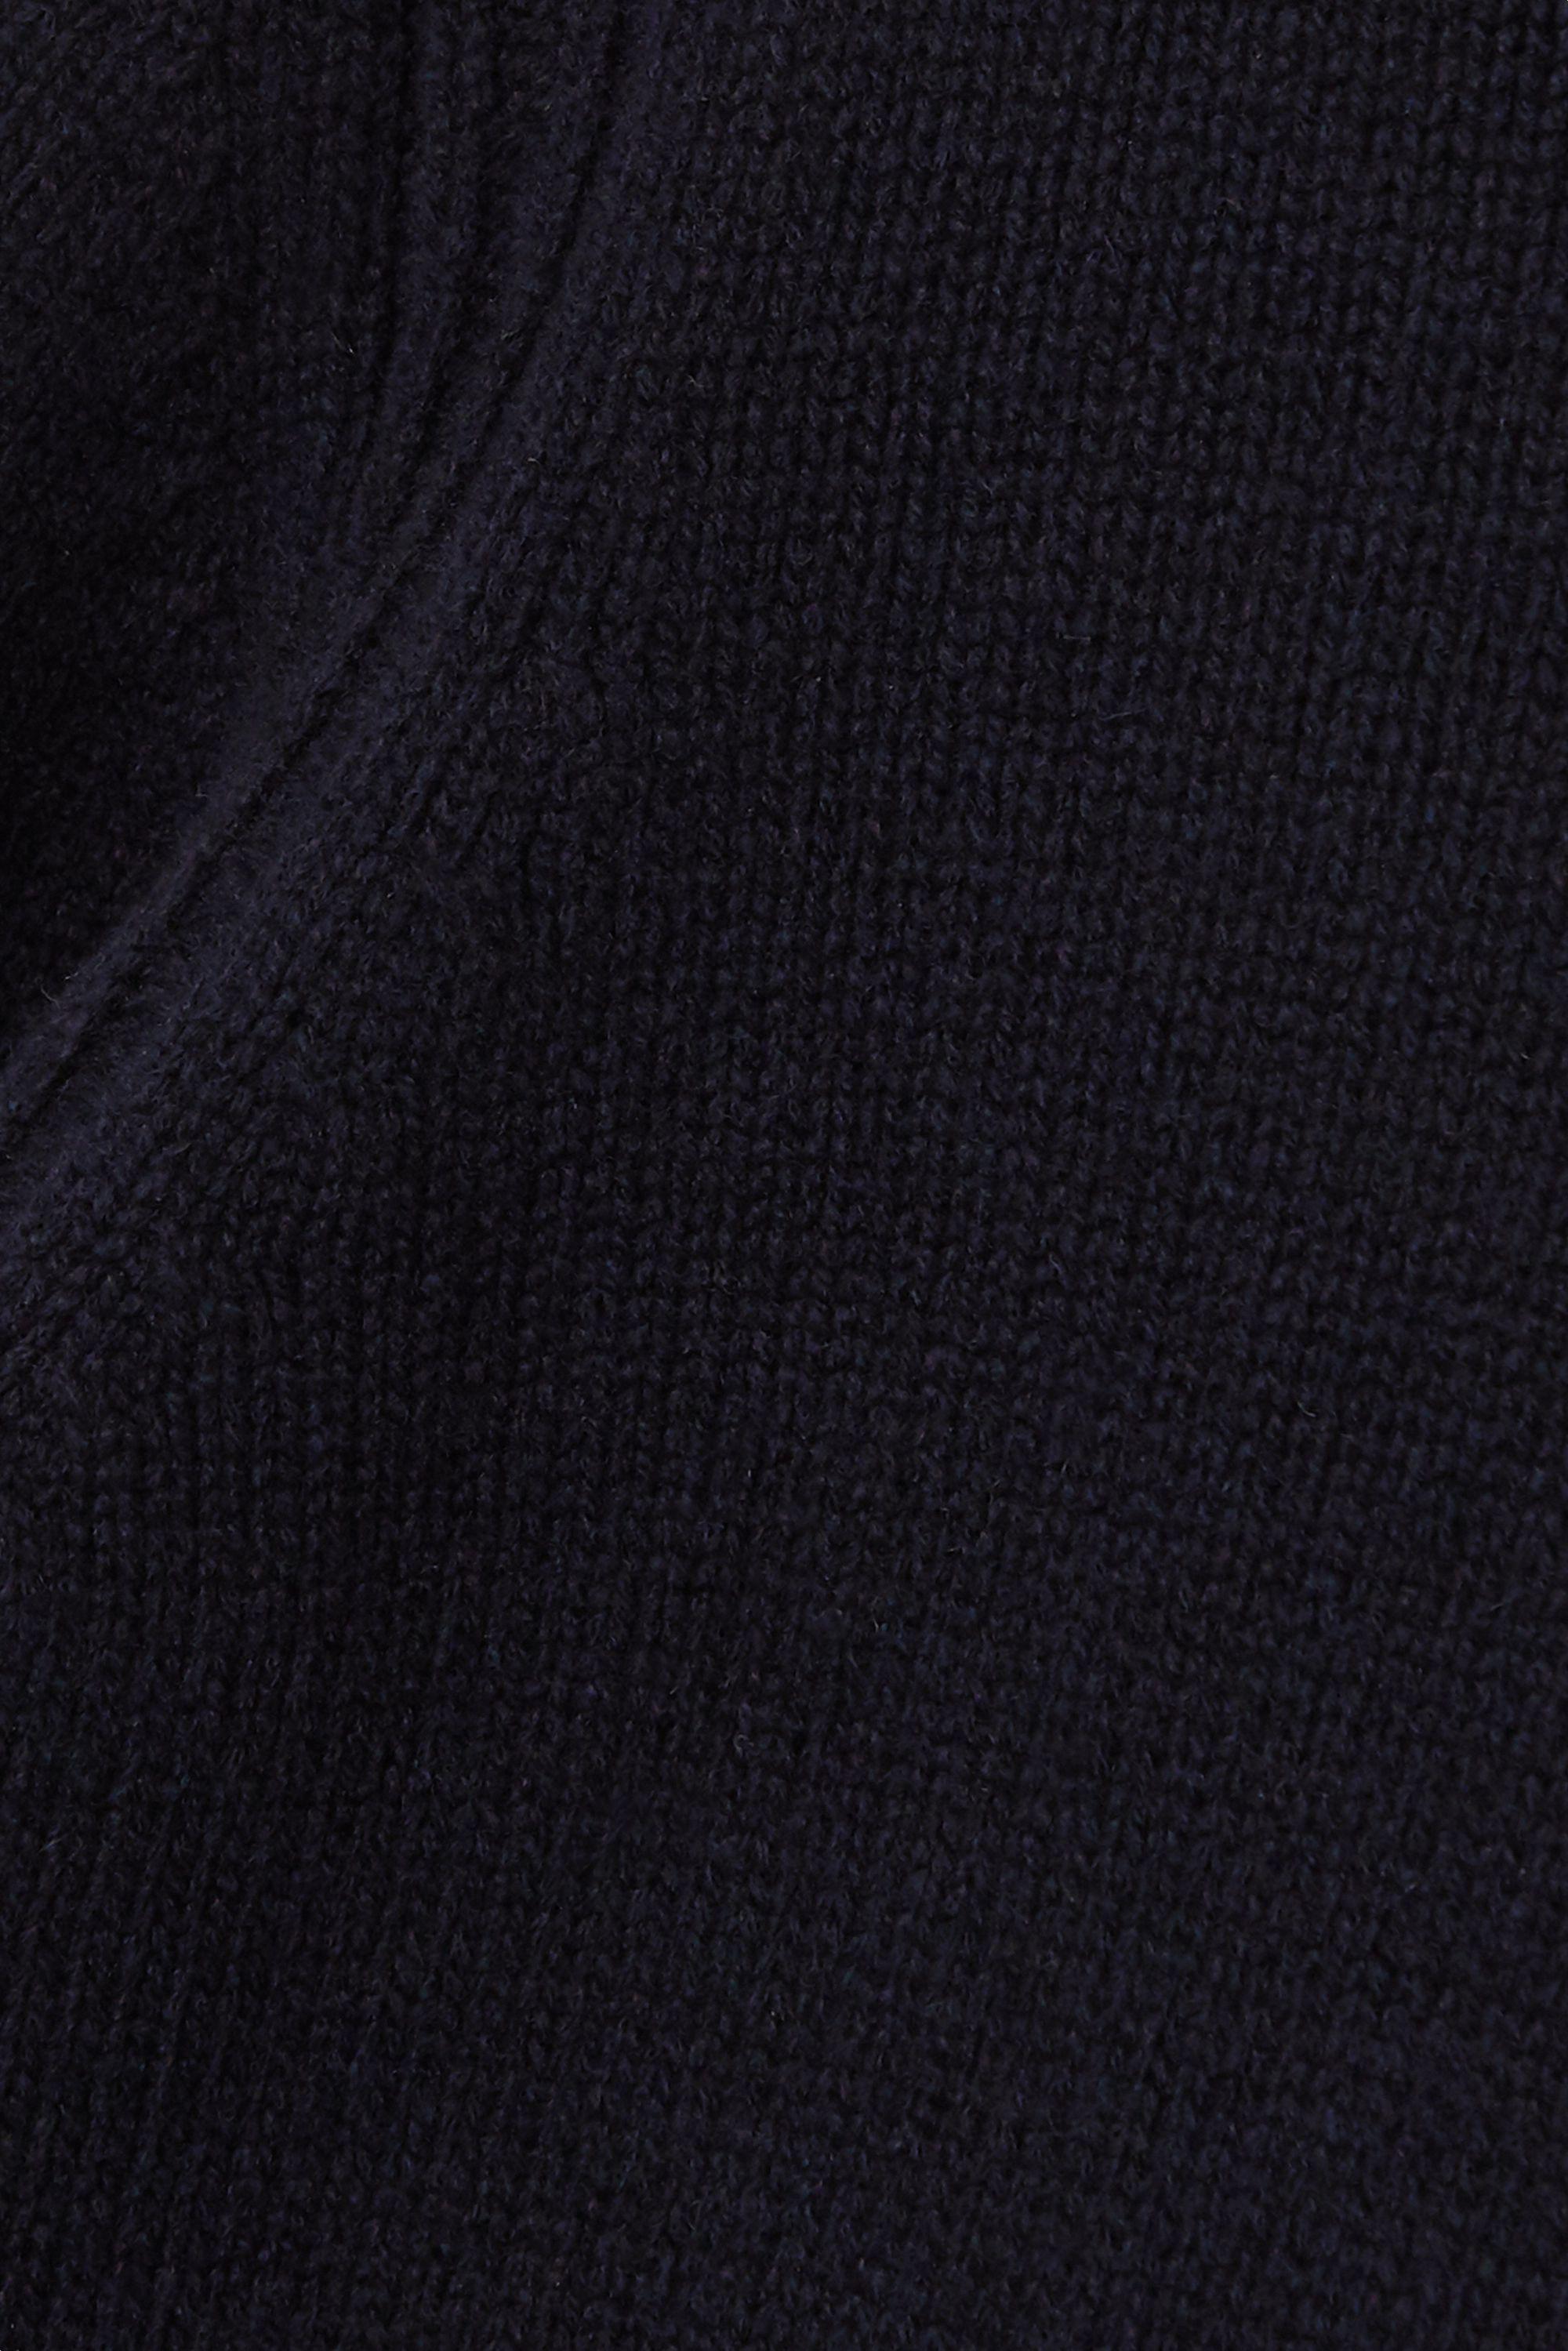 &Daughter + NET SUSTAIN Roshin wool turtleneck sweater